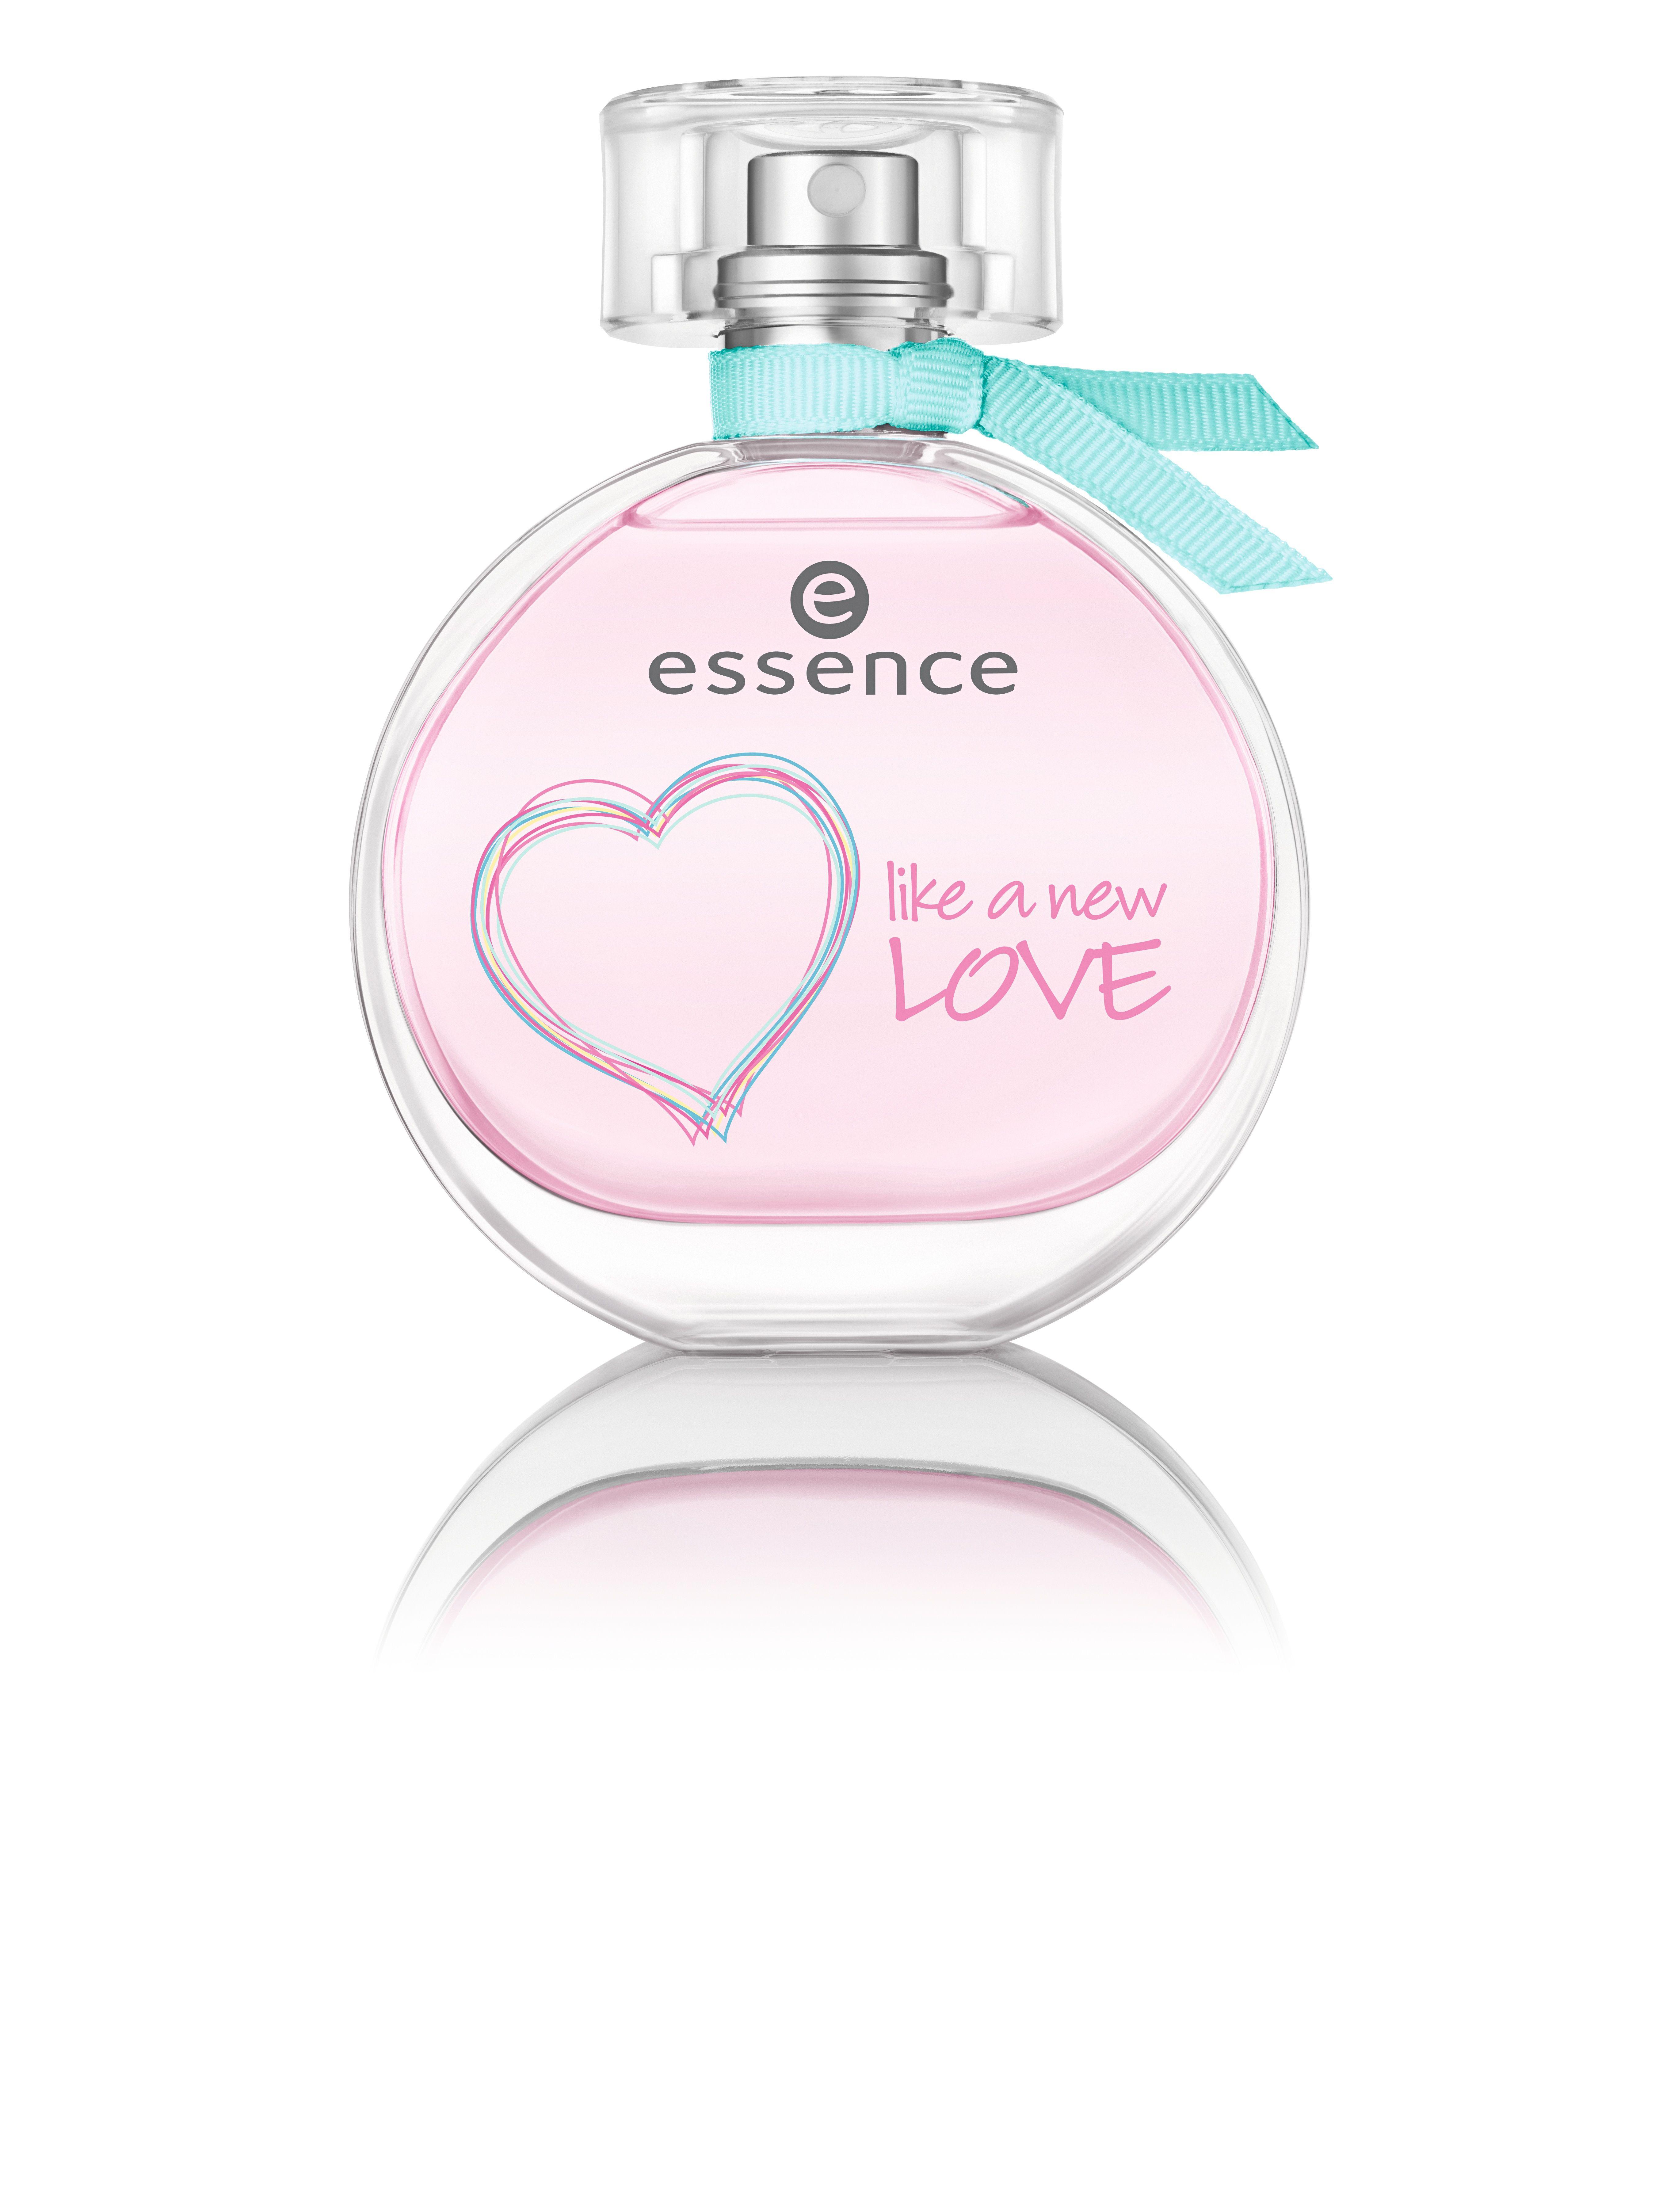 essence like a new love – sehnsucht, aufregung, wie frisch verliebt ...